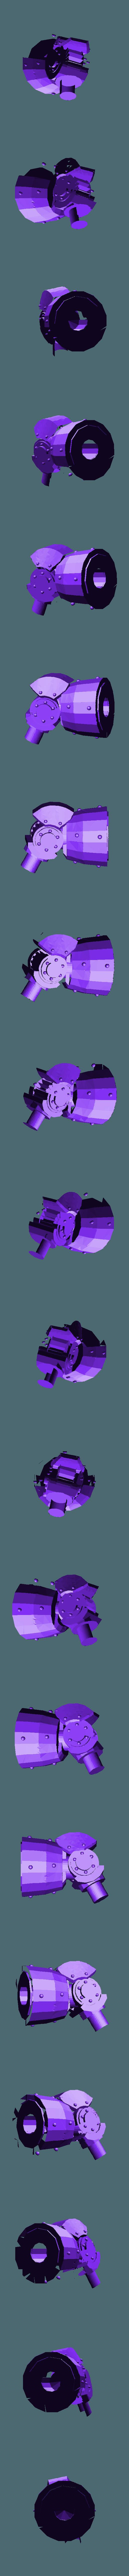 Larm.stl Download free STL file Robot Dread • 3D print template, Mazer